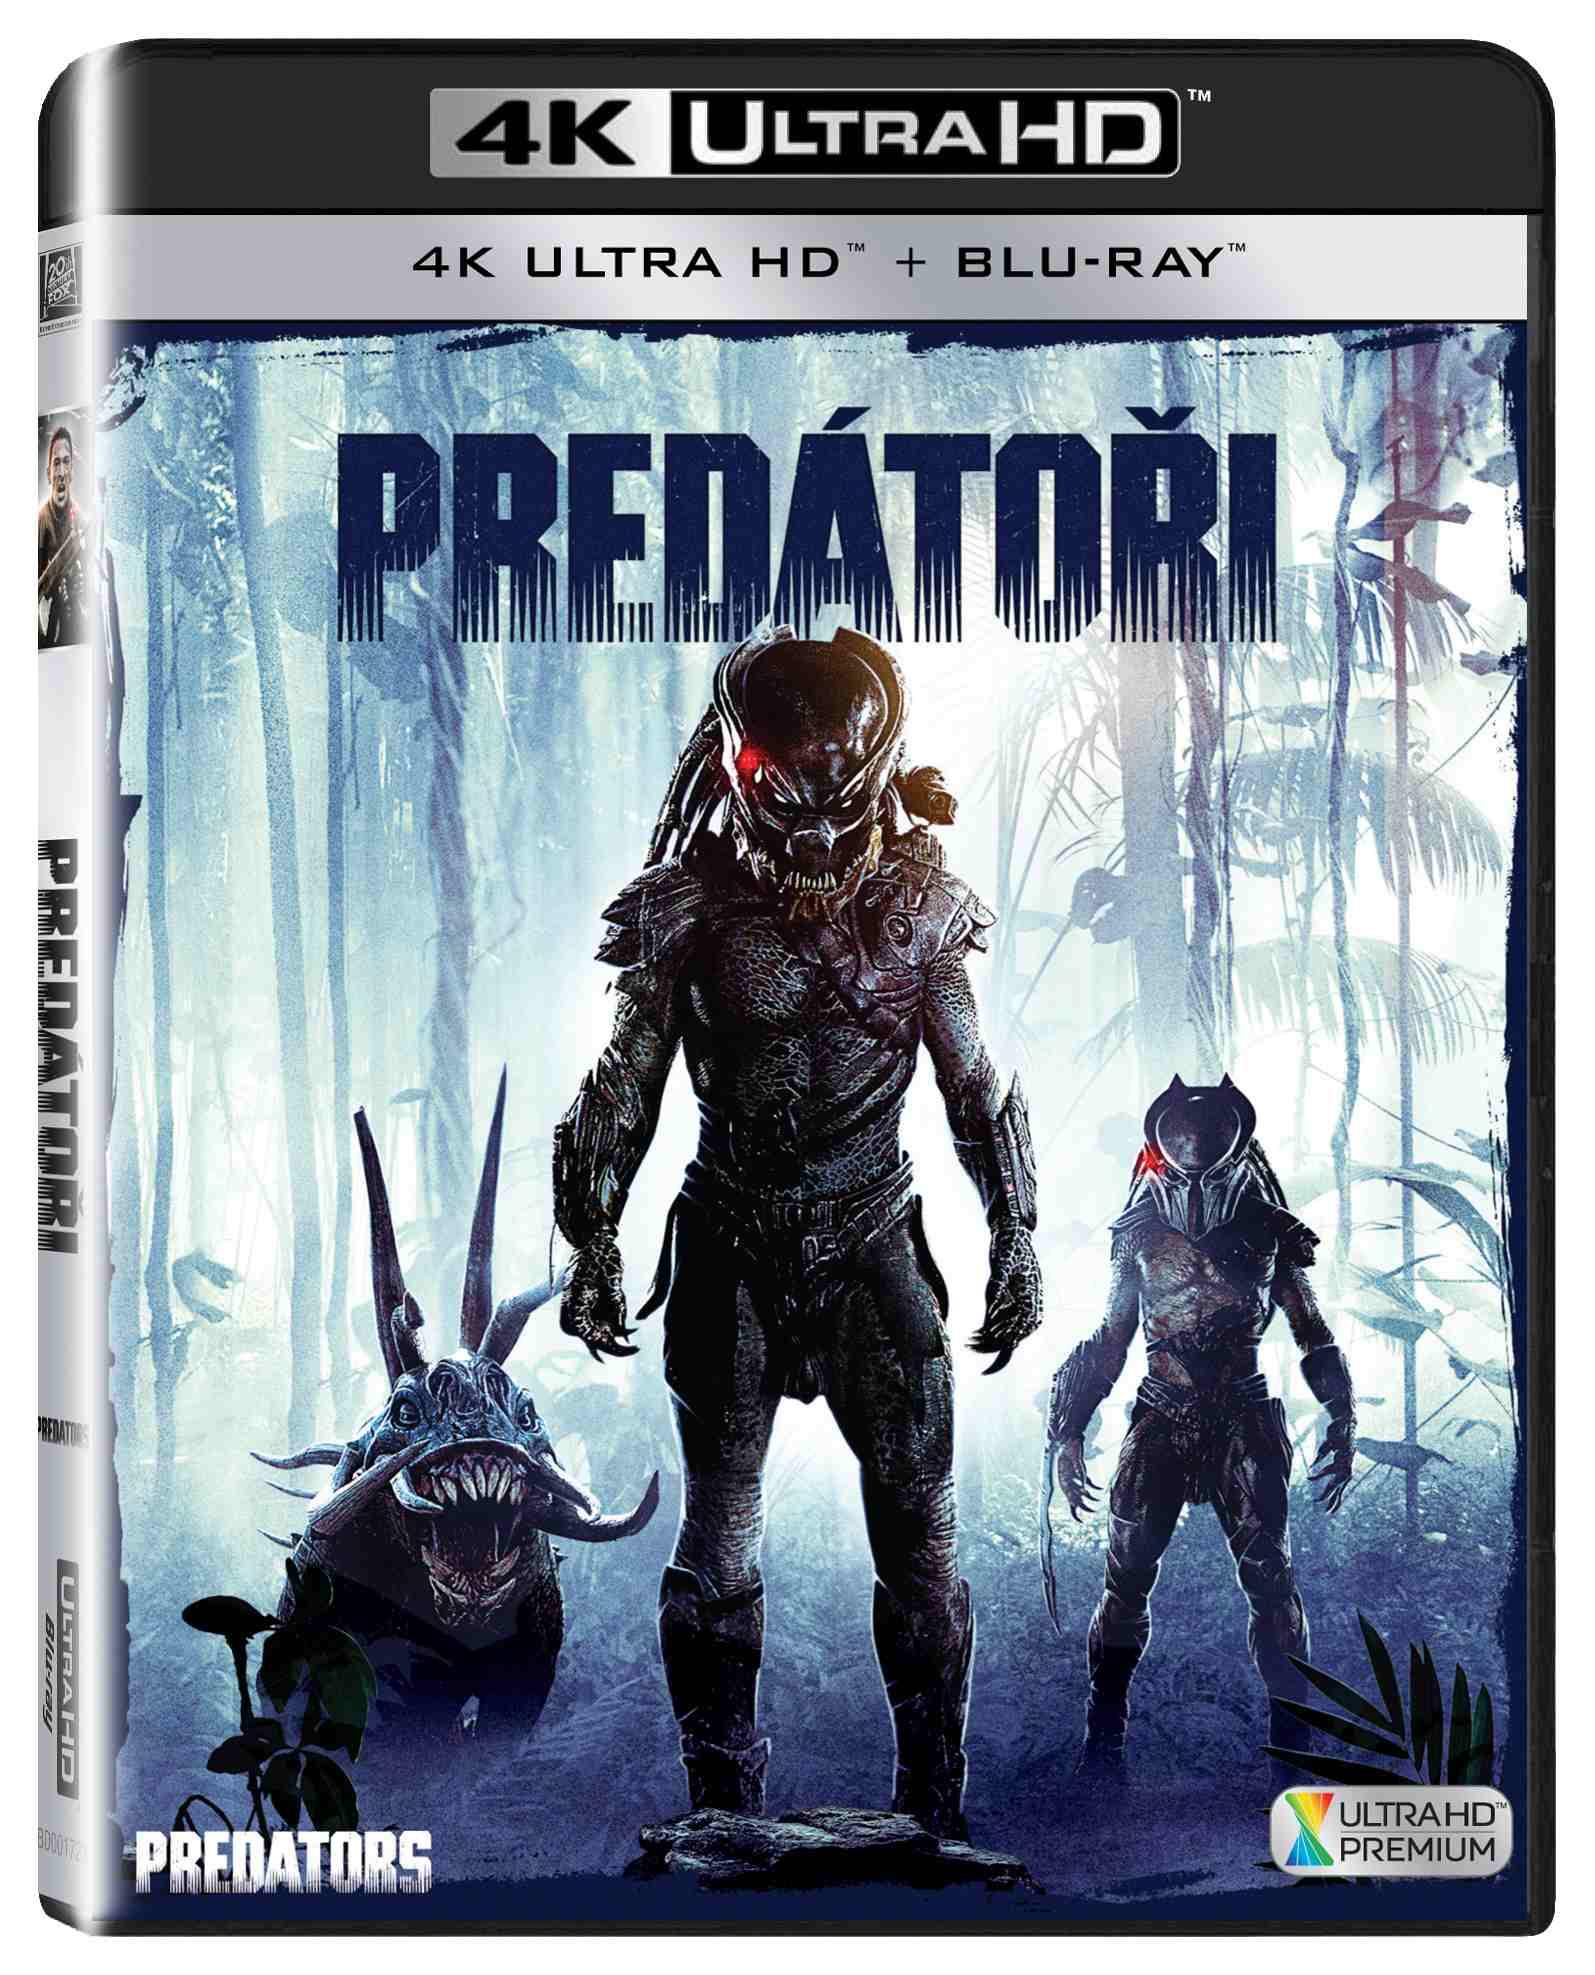 Predátoři (4K ULTRA HD) - UHD Blu-ray + Blu-ray (2 BD)